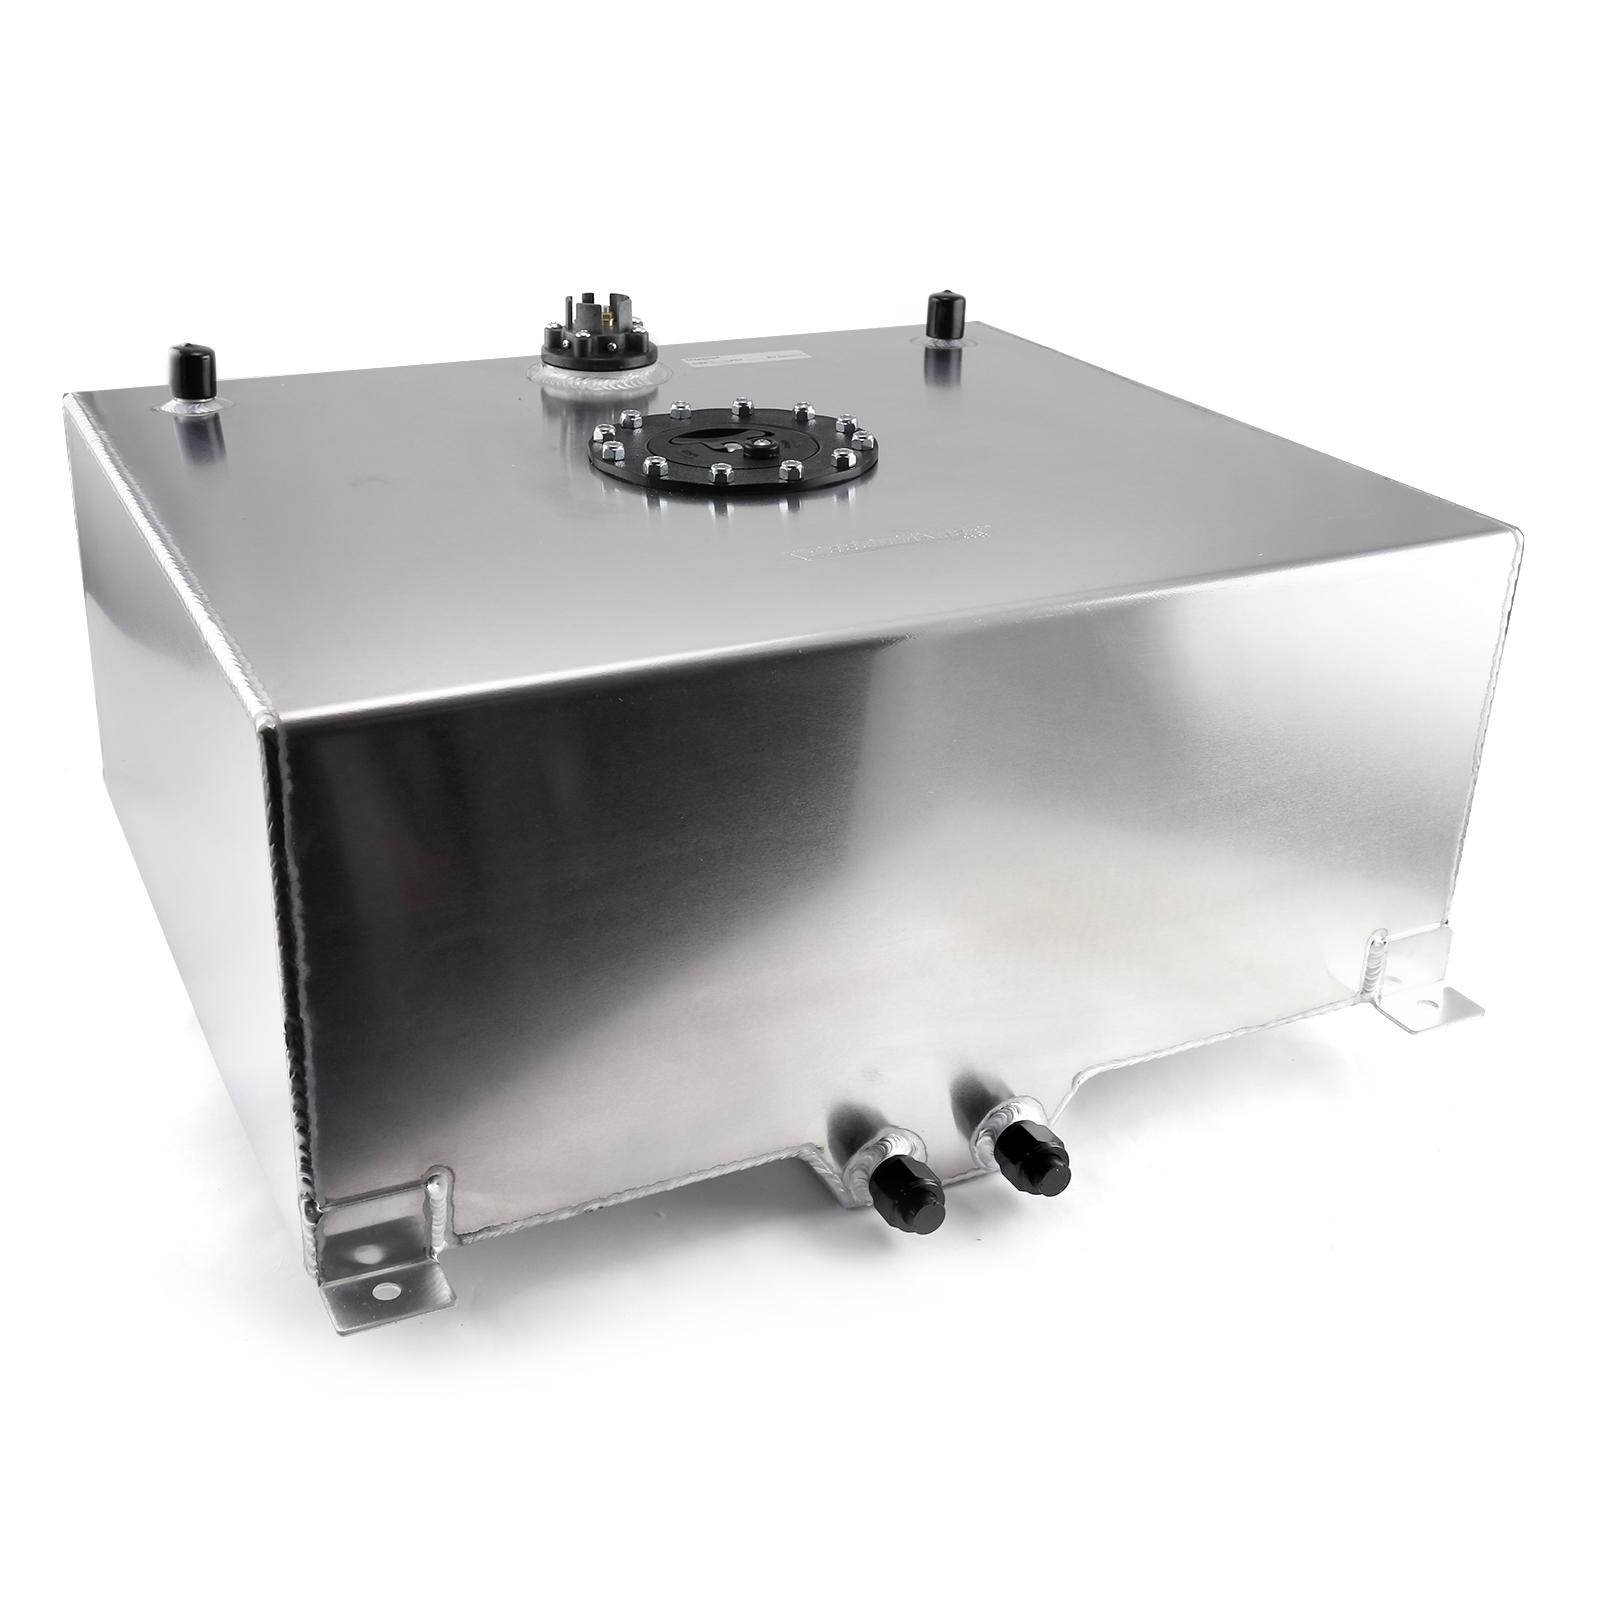 Speedmaster 20 Gallon / 80 Litre Aluminum Fuel Cell w/Sending Unit